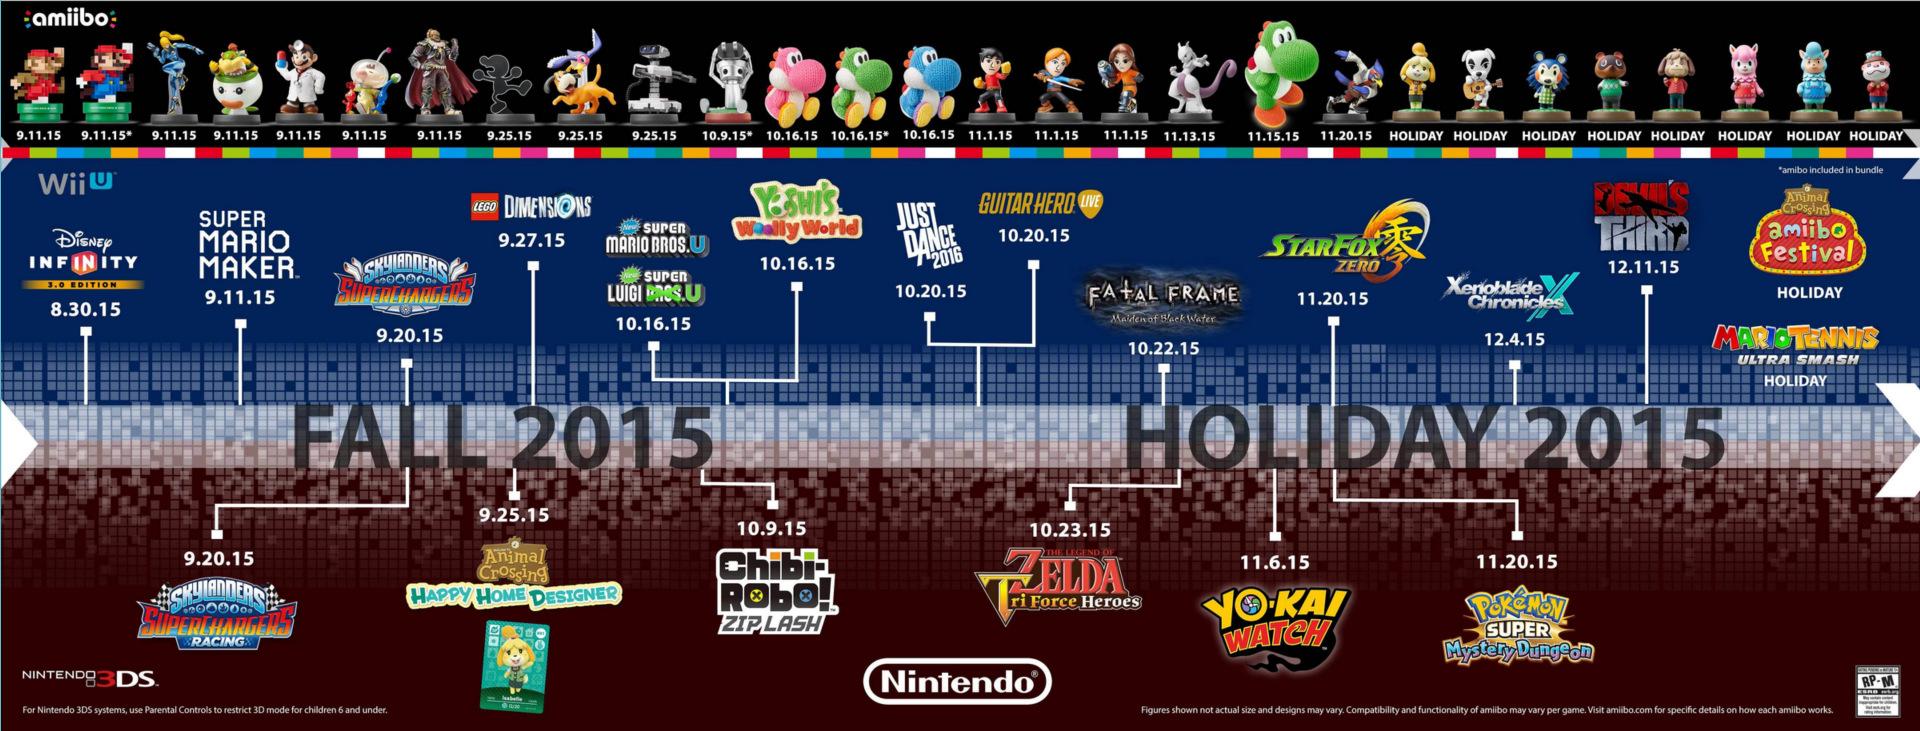 Nintendo Yoshi amiibo games 2015 (4)